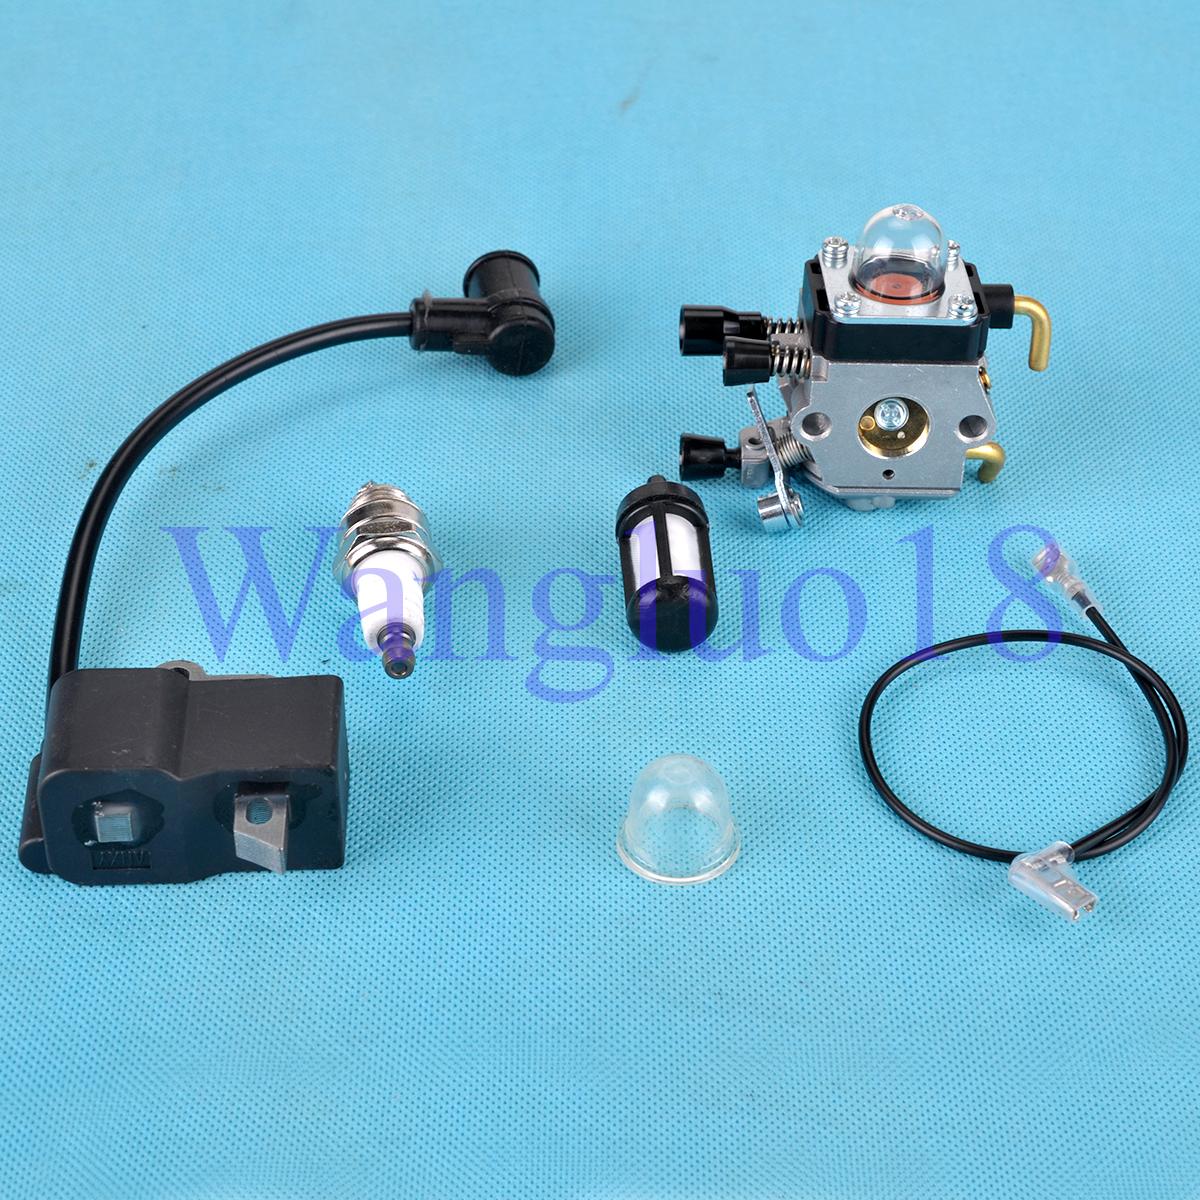 Honda S66 >> Carburettor Ignition coil Fit STIHL FS75 FS80 FS85 FC85 HT70 HS75 HL75 HT75 HS80 | eBay